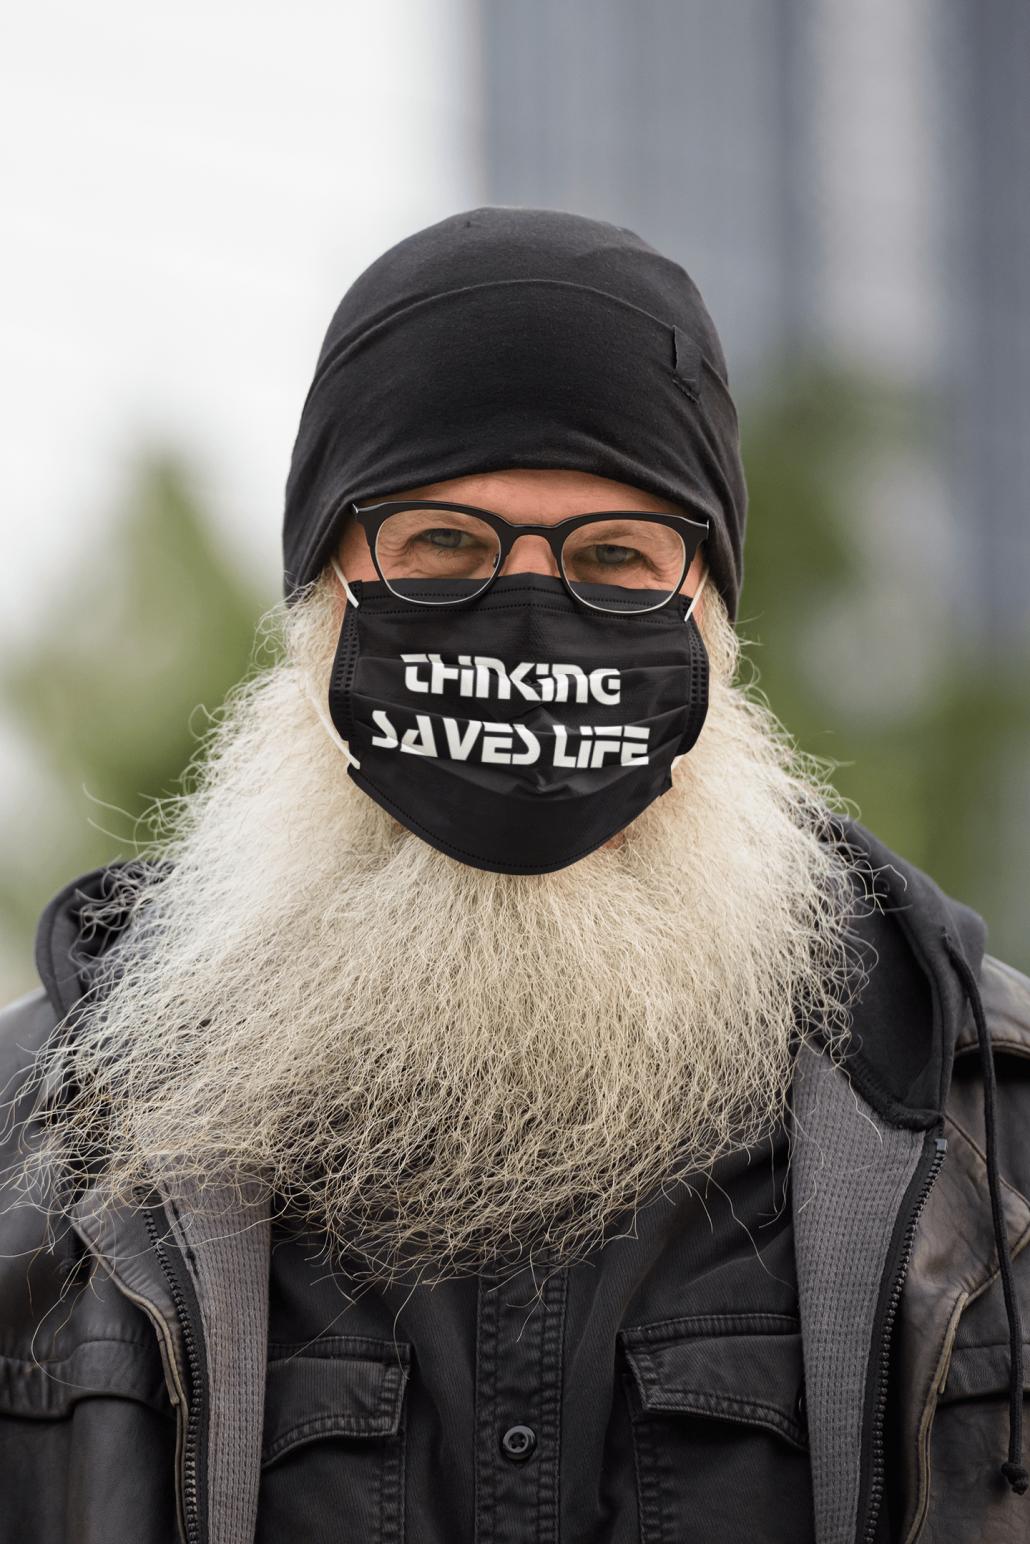 Man with beard and custom face mask